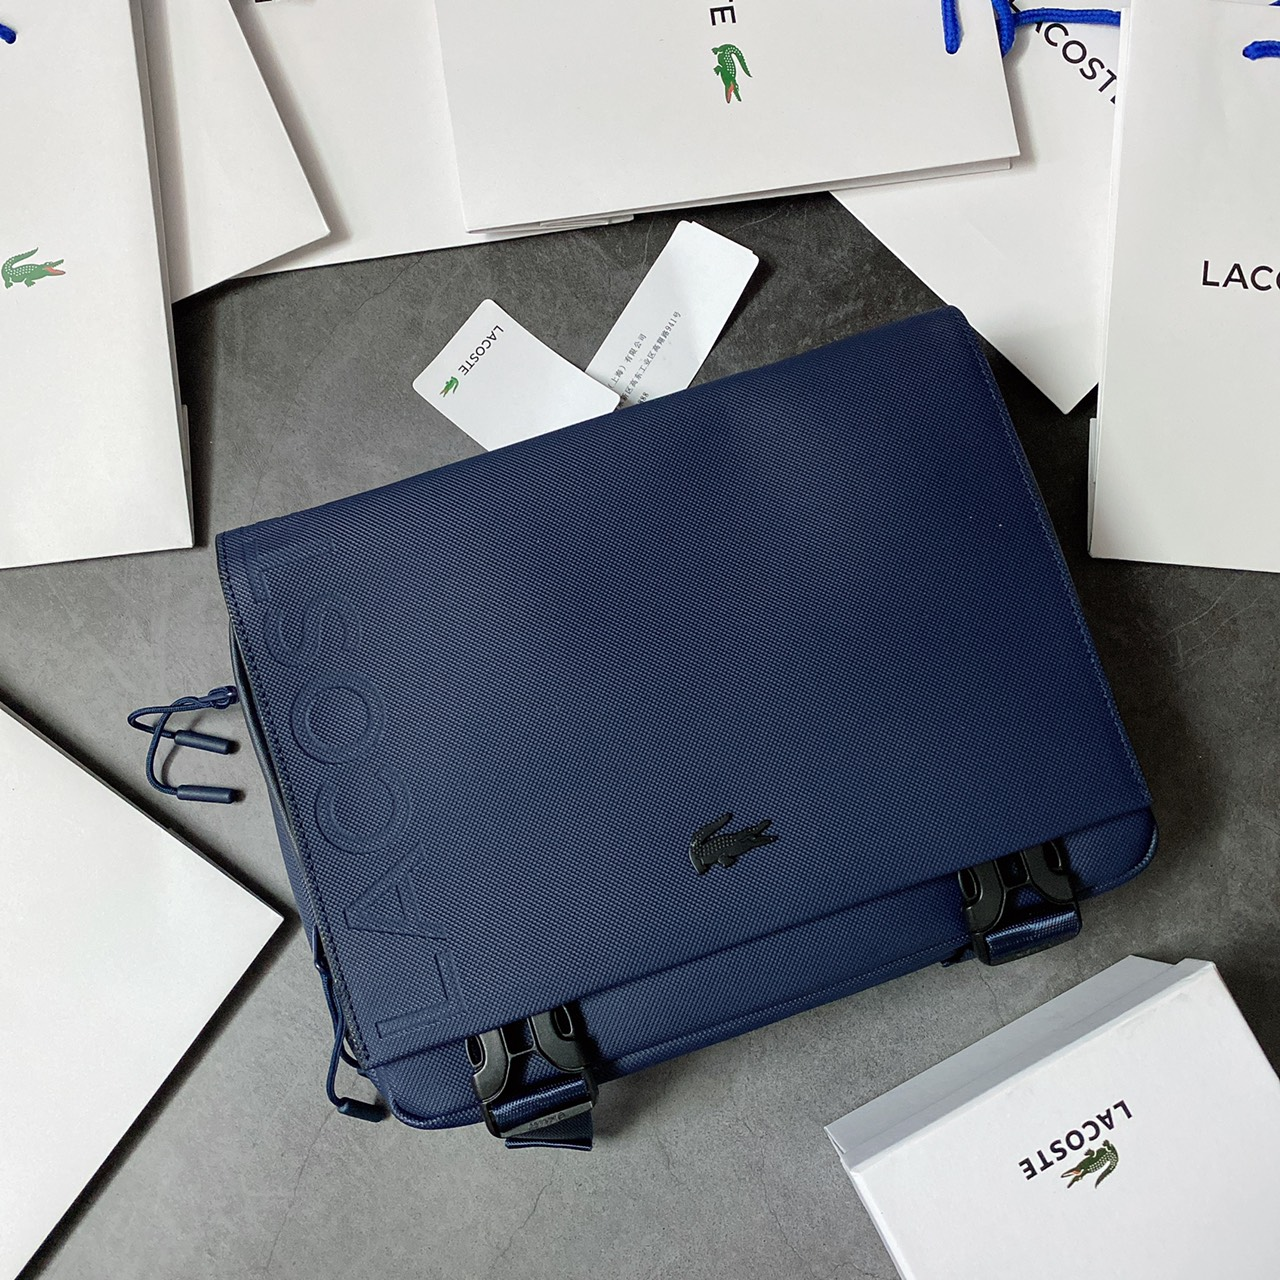 Túi Lacoste office nắp gập logo dọc - XK820